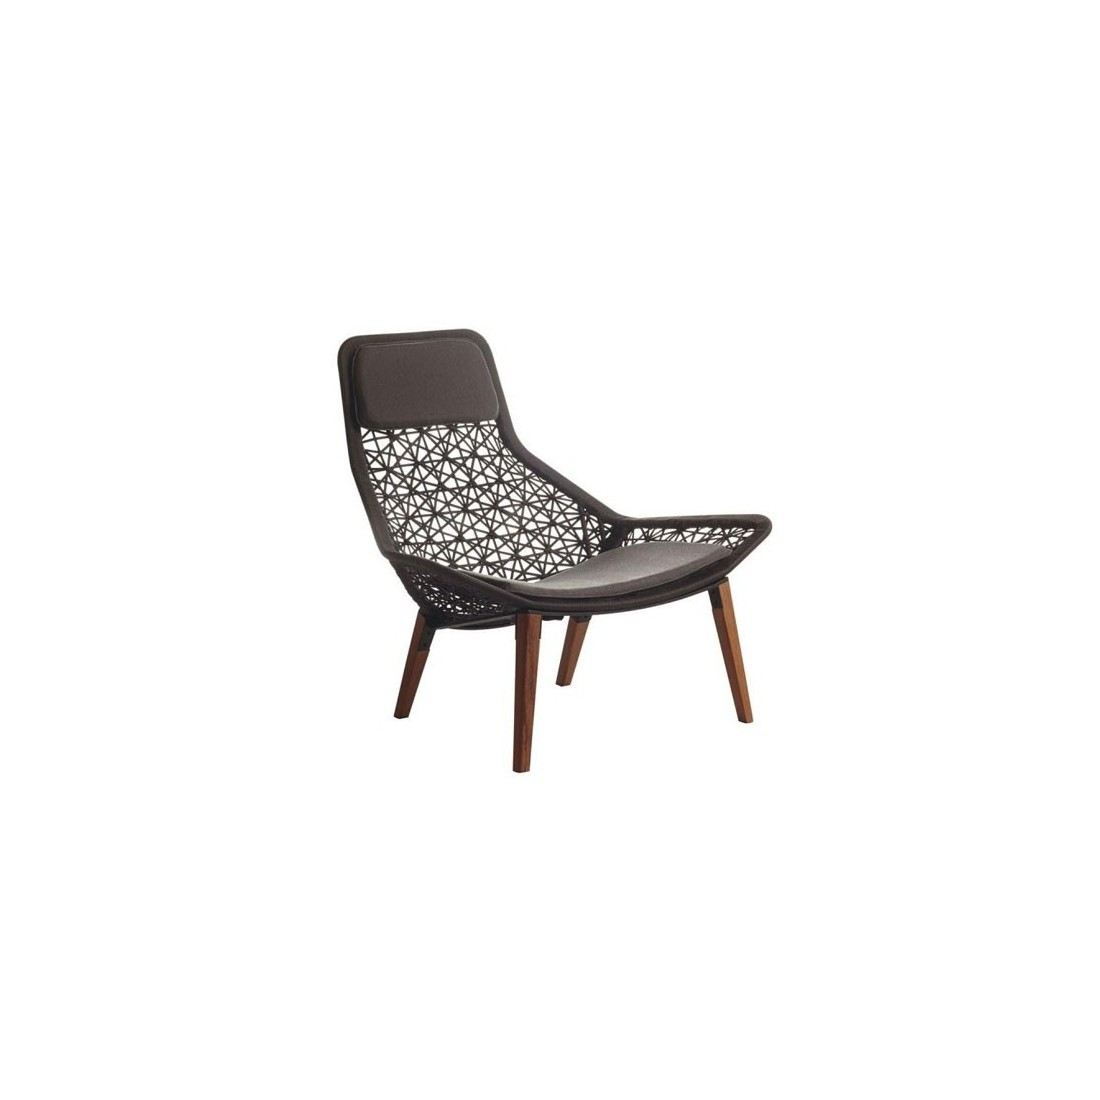 fauteuil relax maia pieds en teck kettal kettal confort. Black Bedroom Furniture Sets. Home Design Ideas